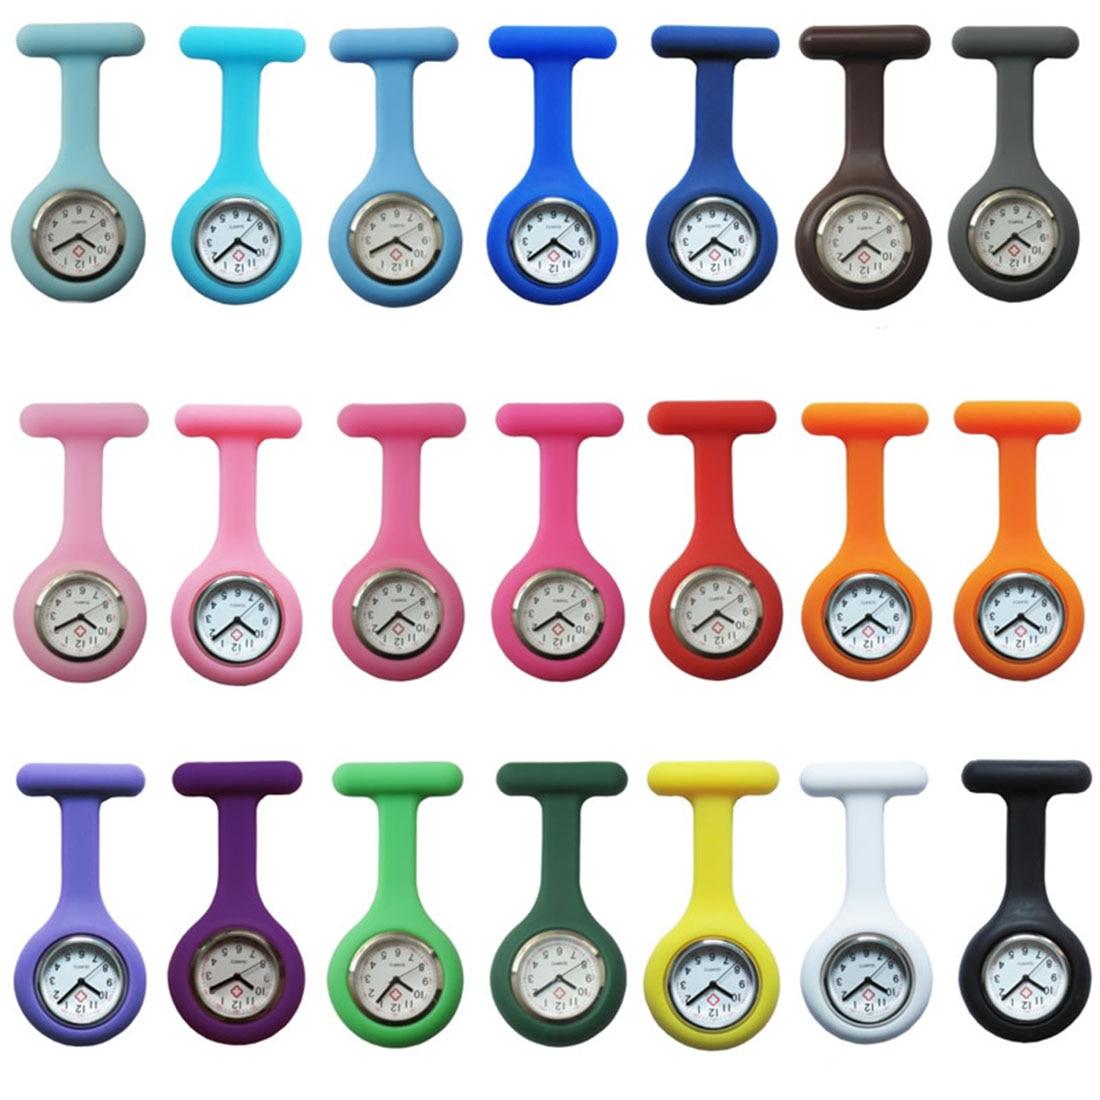 5PCs/Lot Pocket Watch Clip-On Fob Quartz Brooch Hanging Rubber Silicone Nurse Watch Fashion Casual Men Women Relogio Feminino